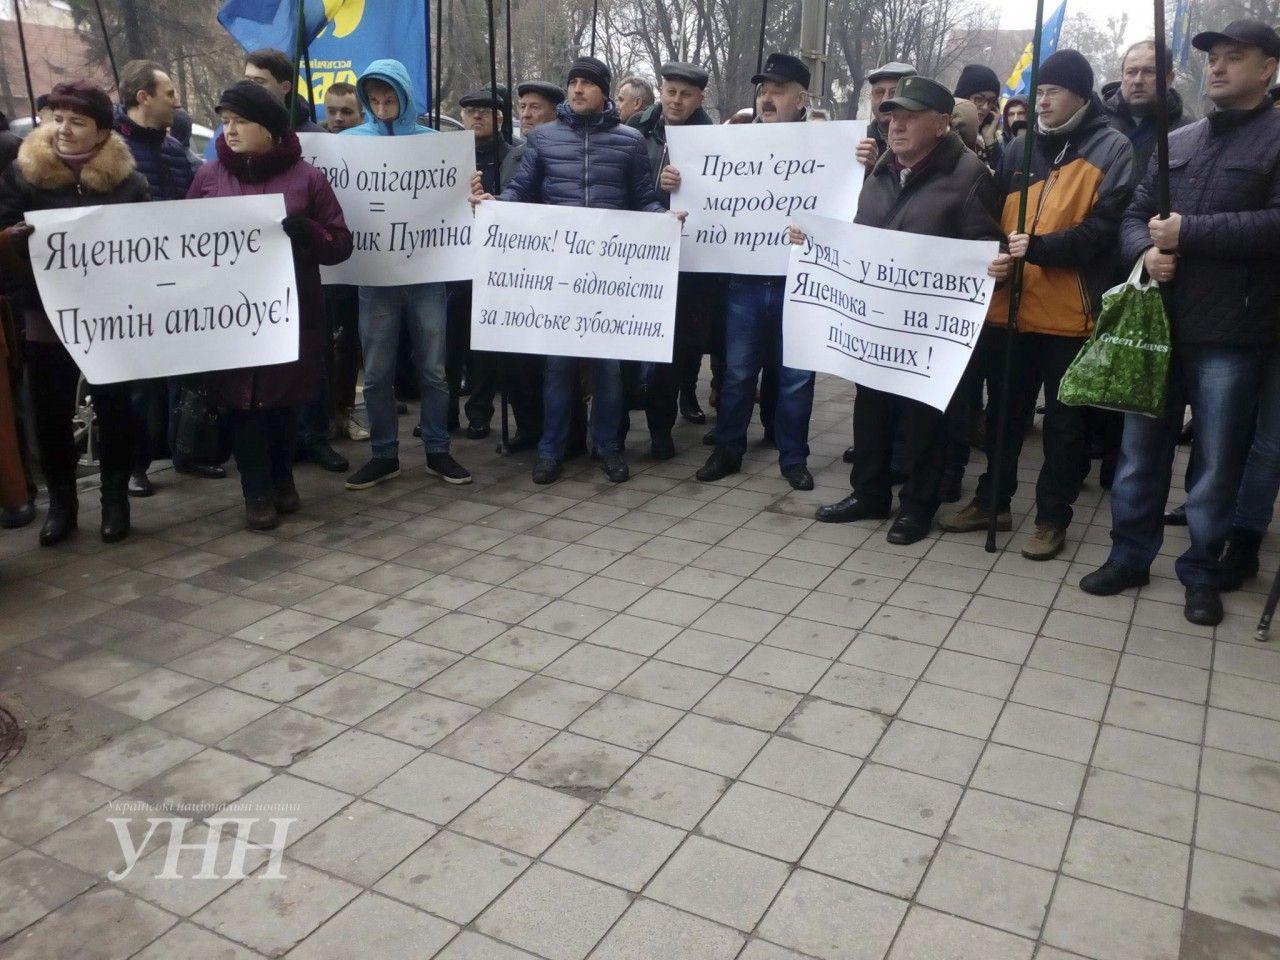 Митингующие требуют отставки Кабмина